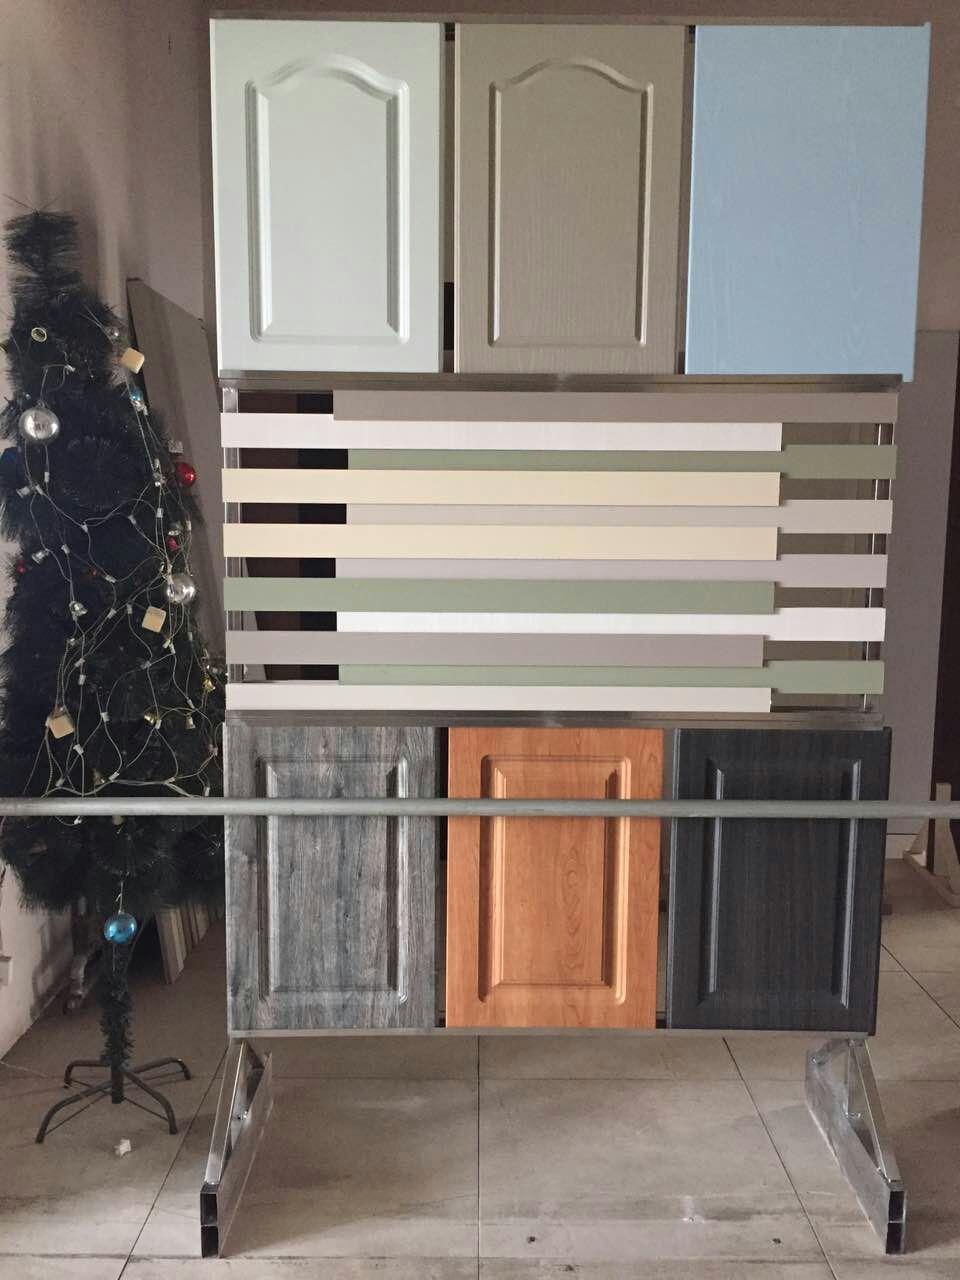 Wood Grain PVC Films